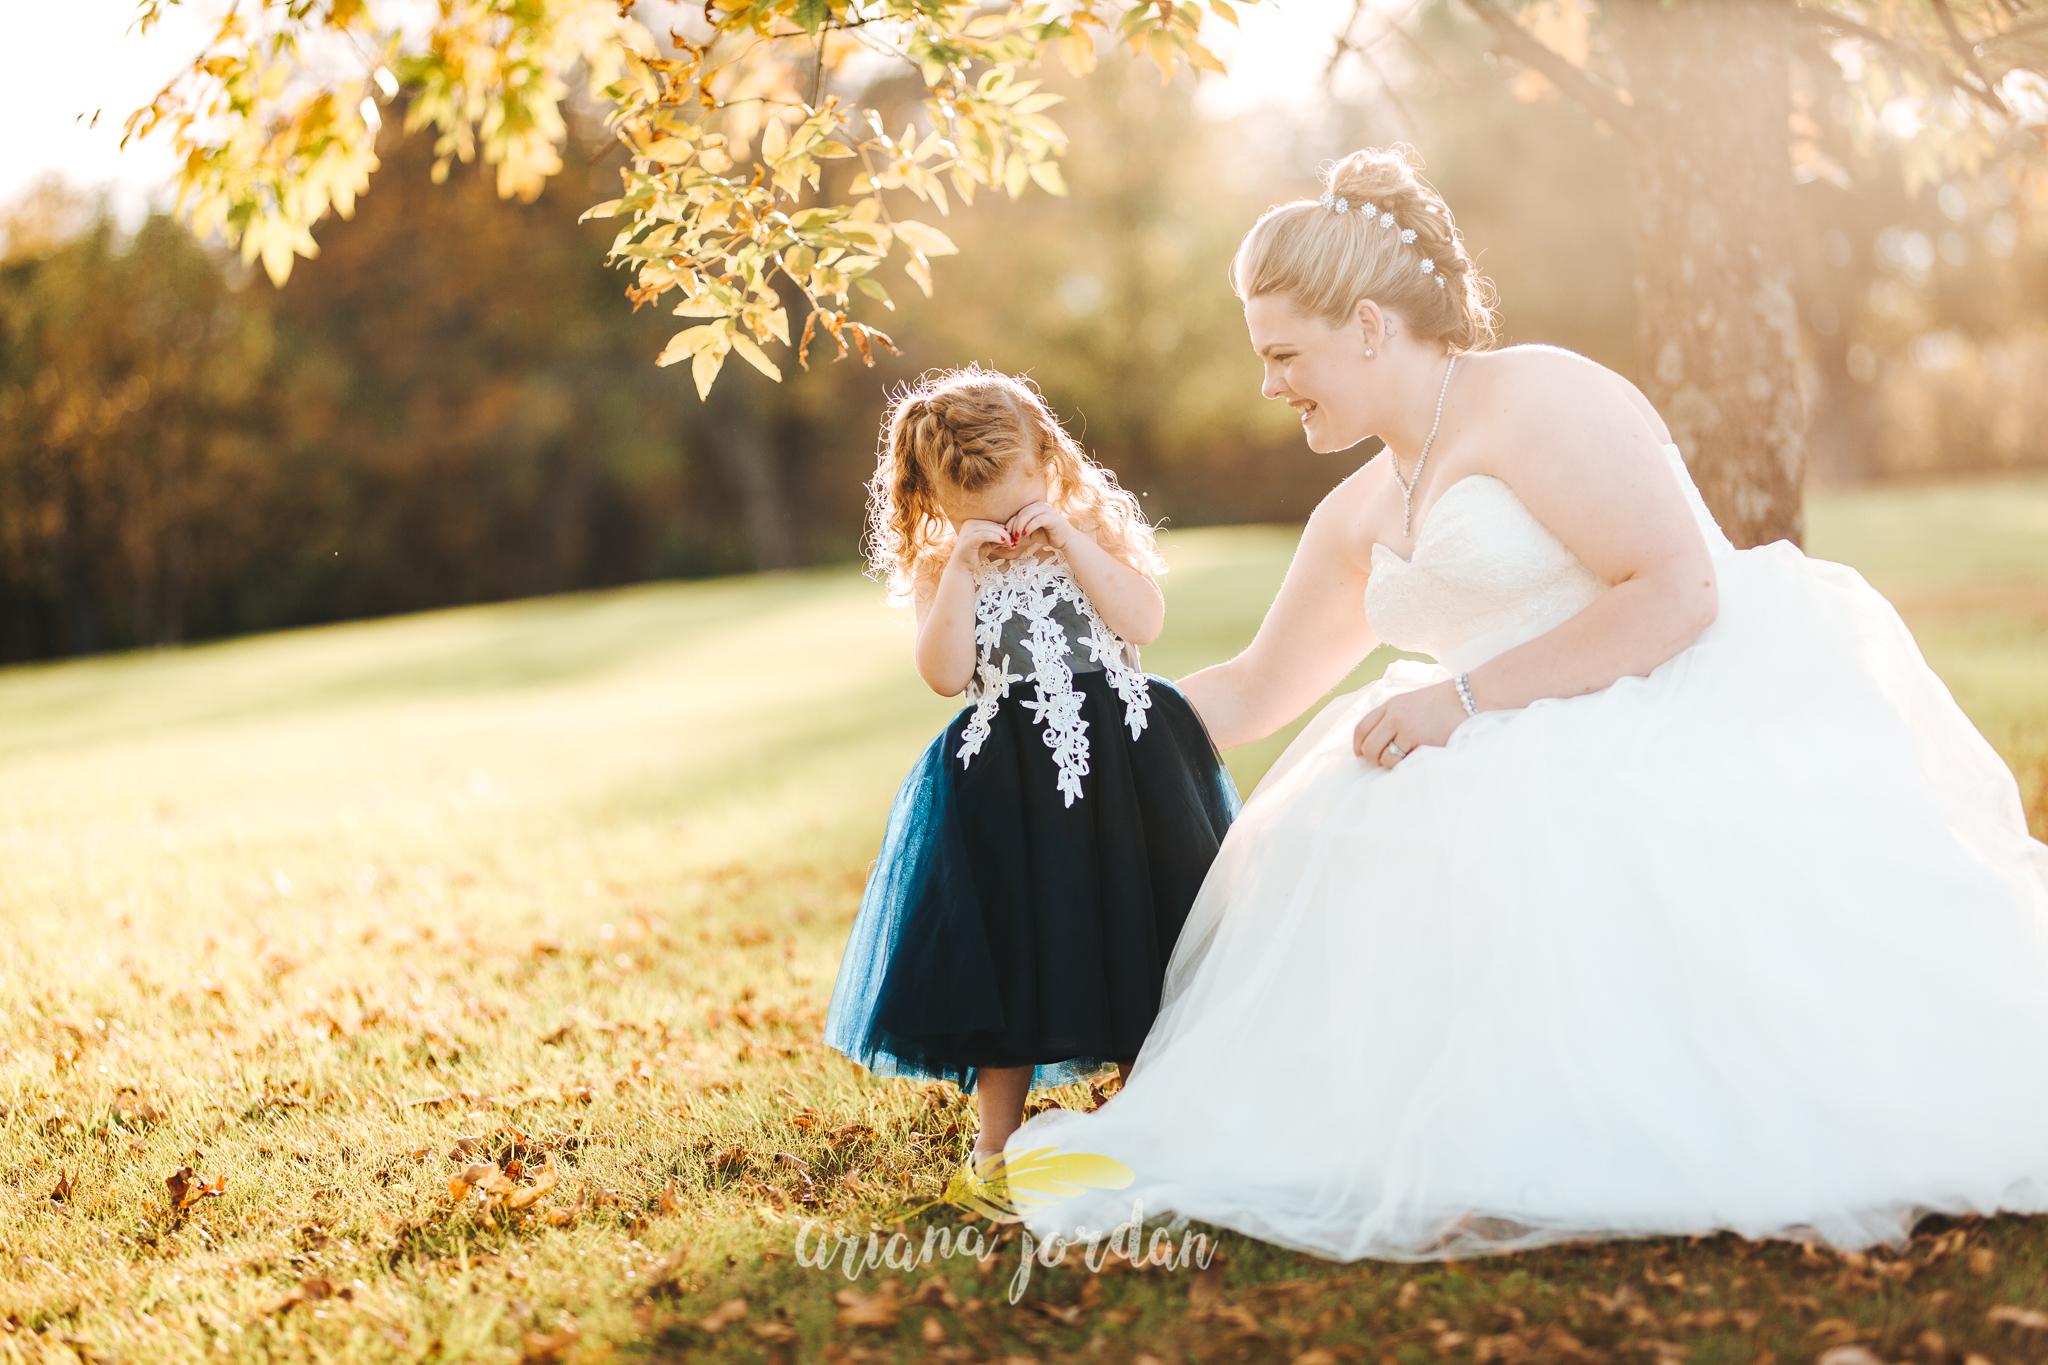 0061 Ariana Jordan Photography - Georgetown KY Wedding Photographer 6730.jpg